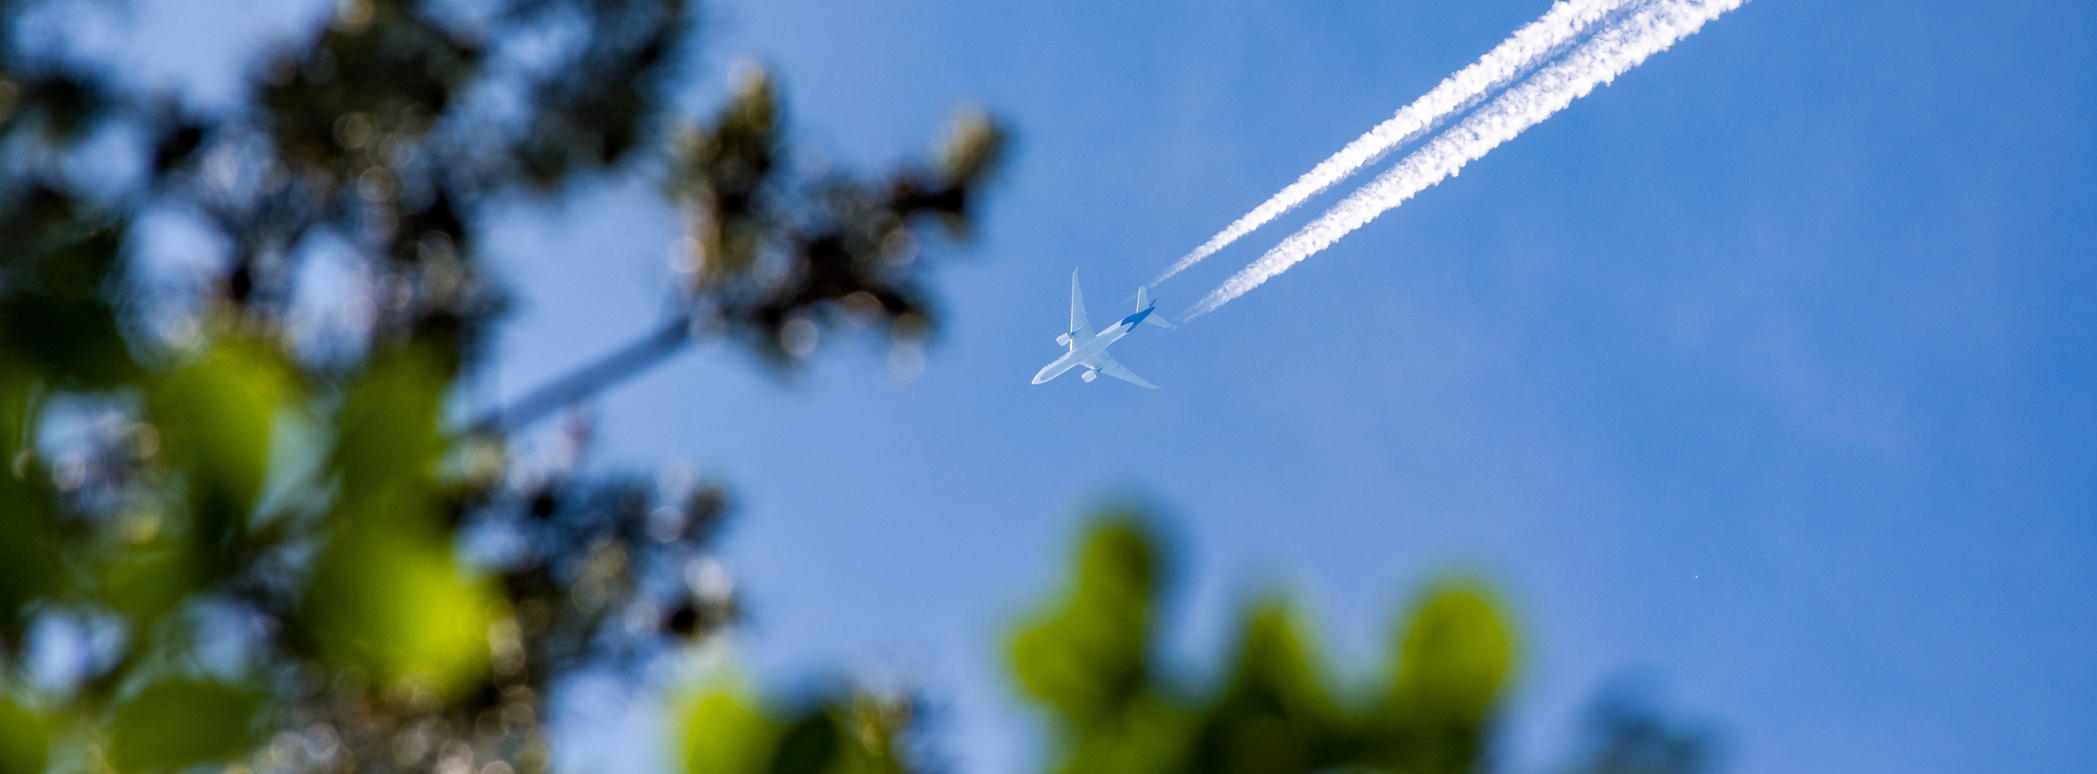 Flugzeug fliegt über Wald